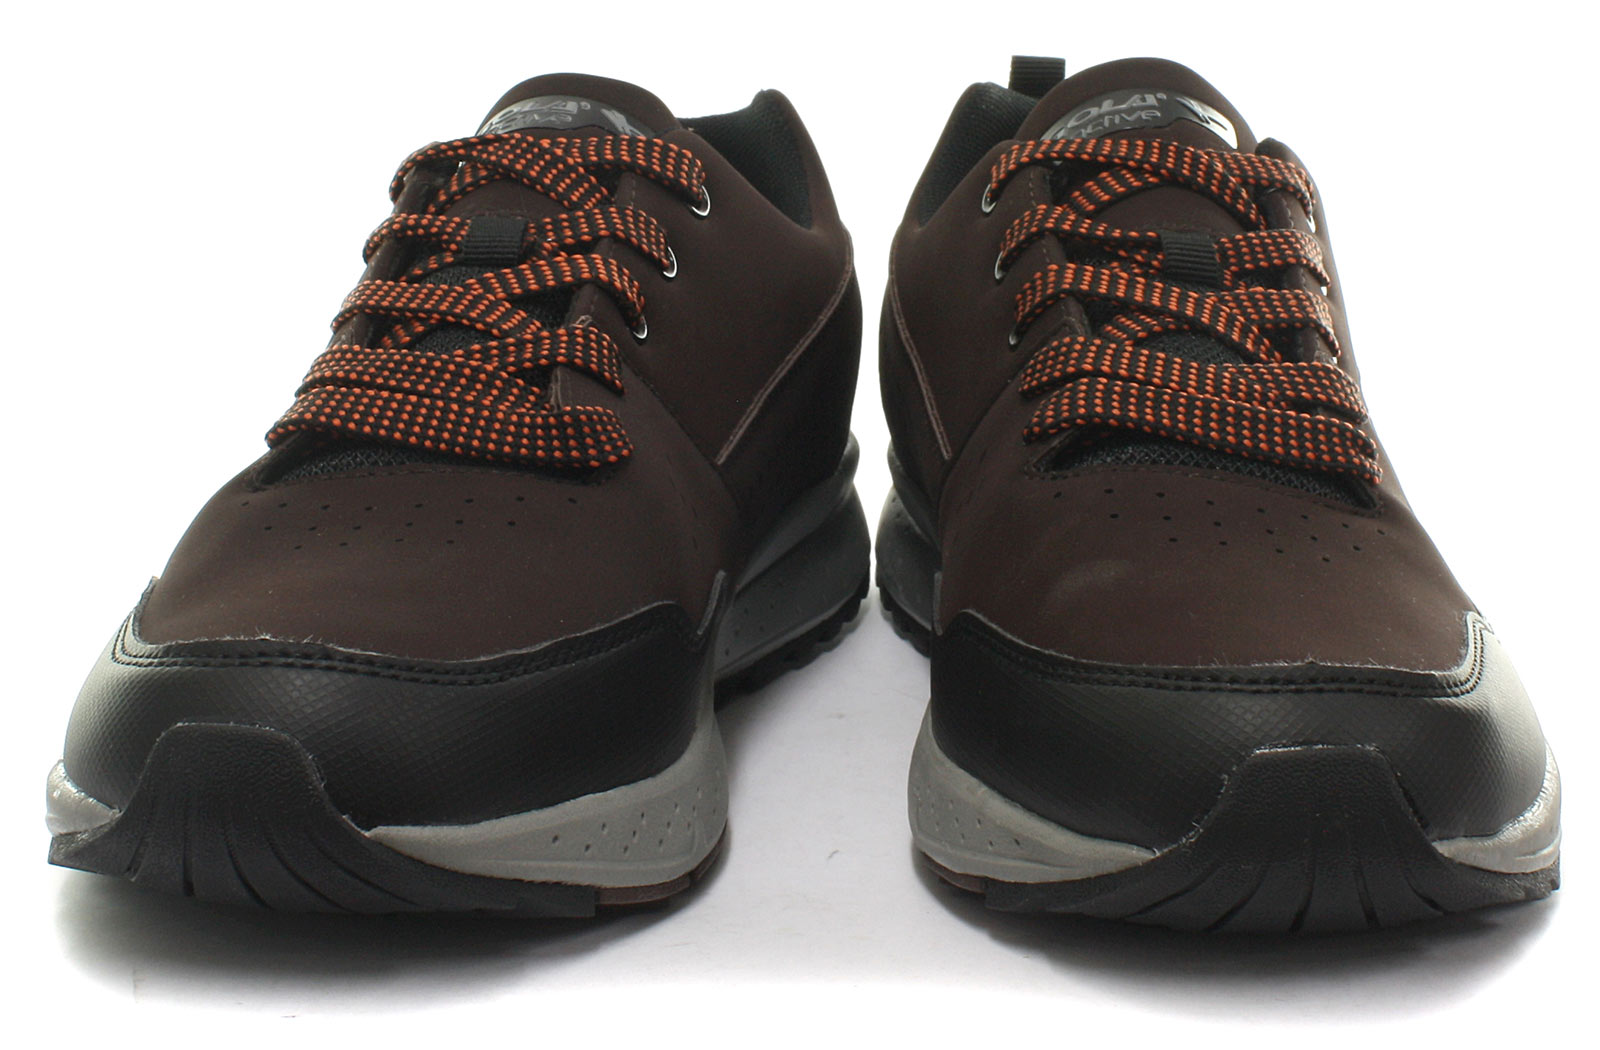 ee3b9fcb65e New Gola Active Glarus Brown Mens Urban Trekking Trail Shoes ALL ...